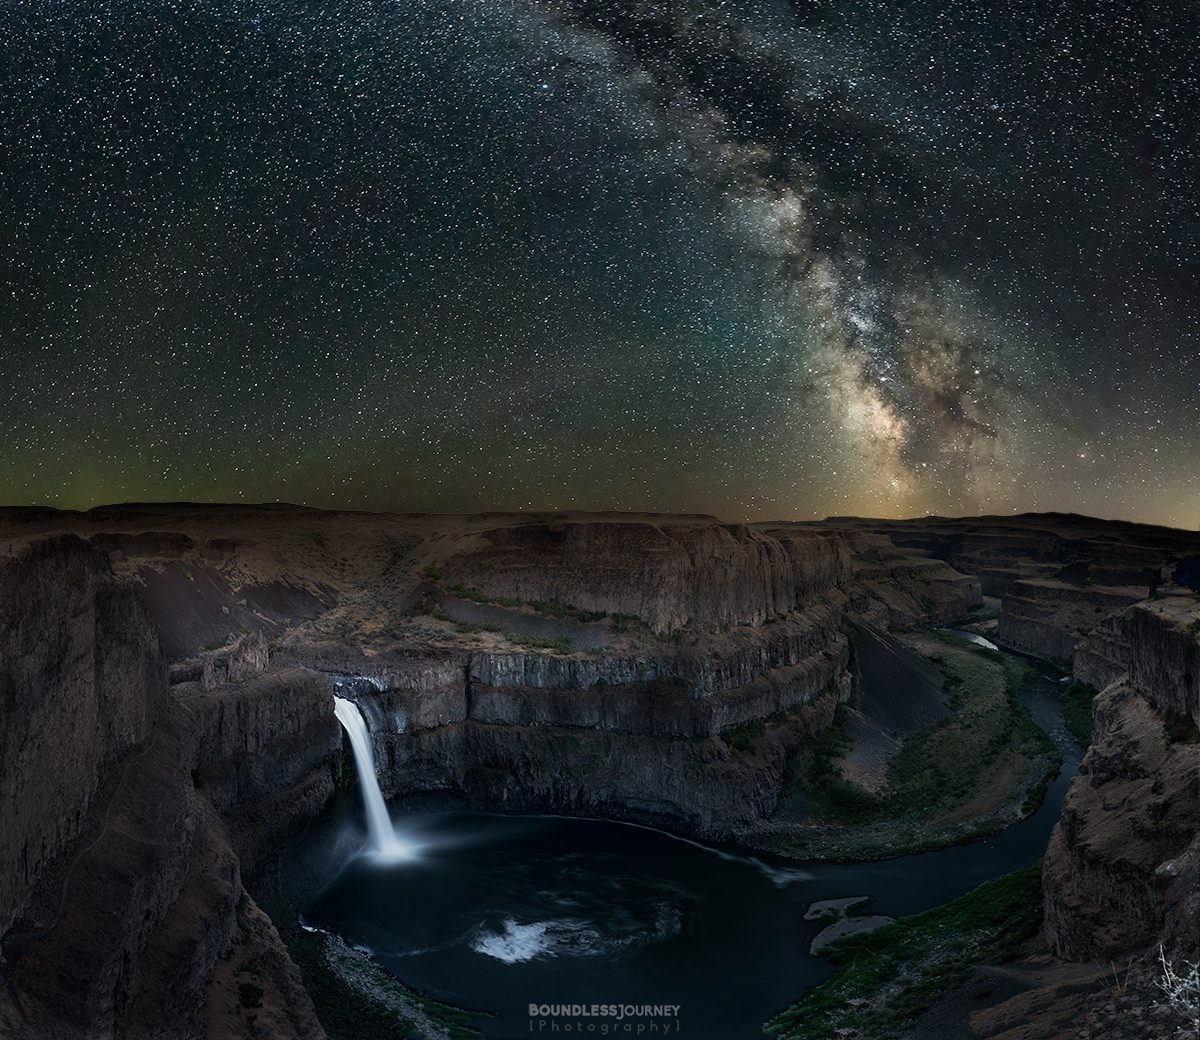 Milky way over Palouse Falls